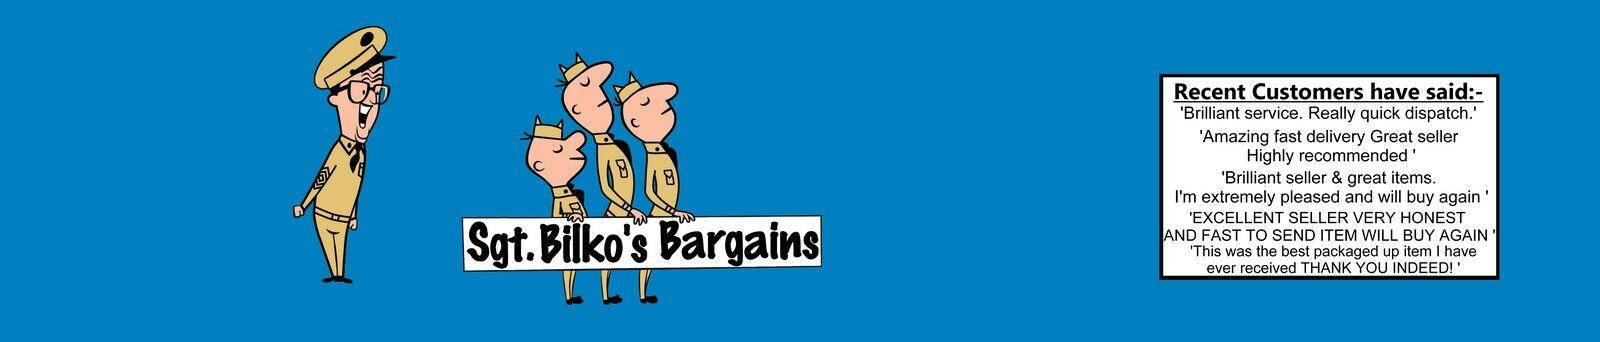 Sgt Bilkos Bargains